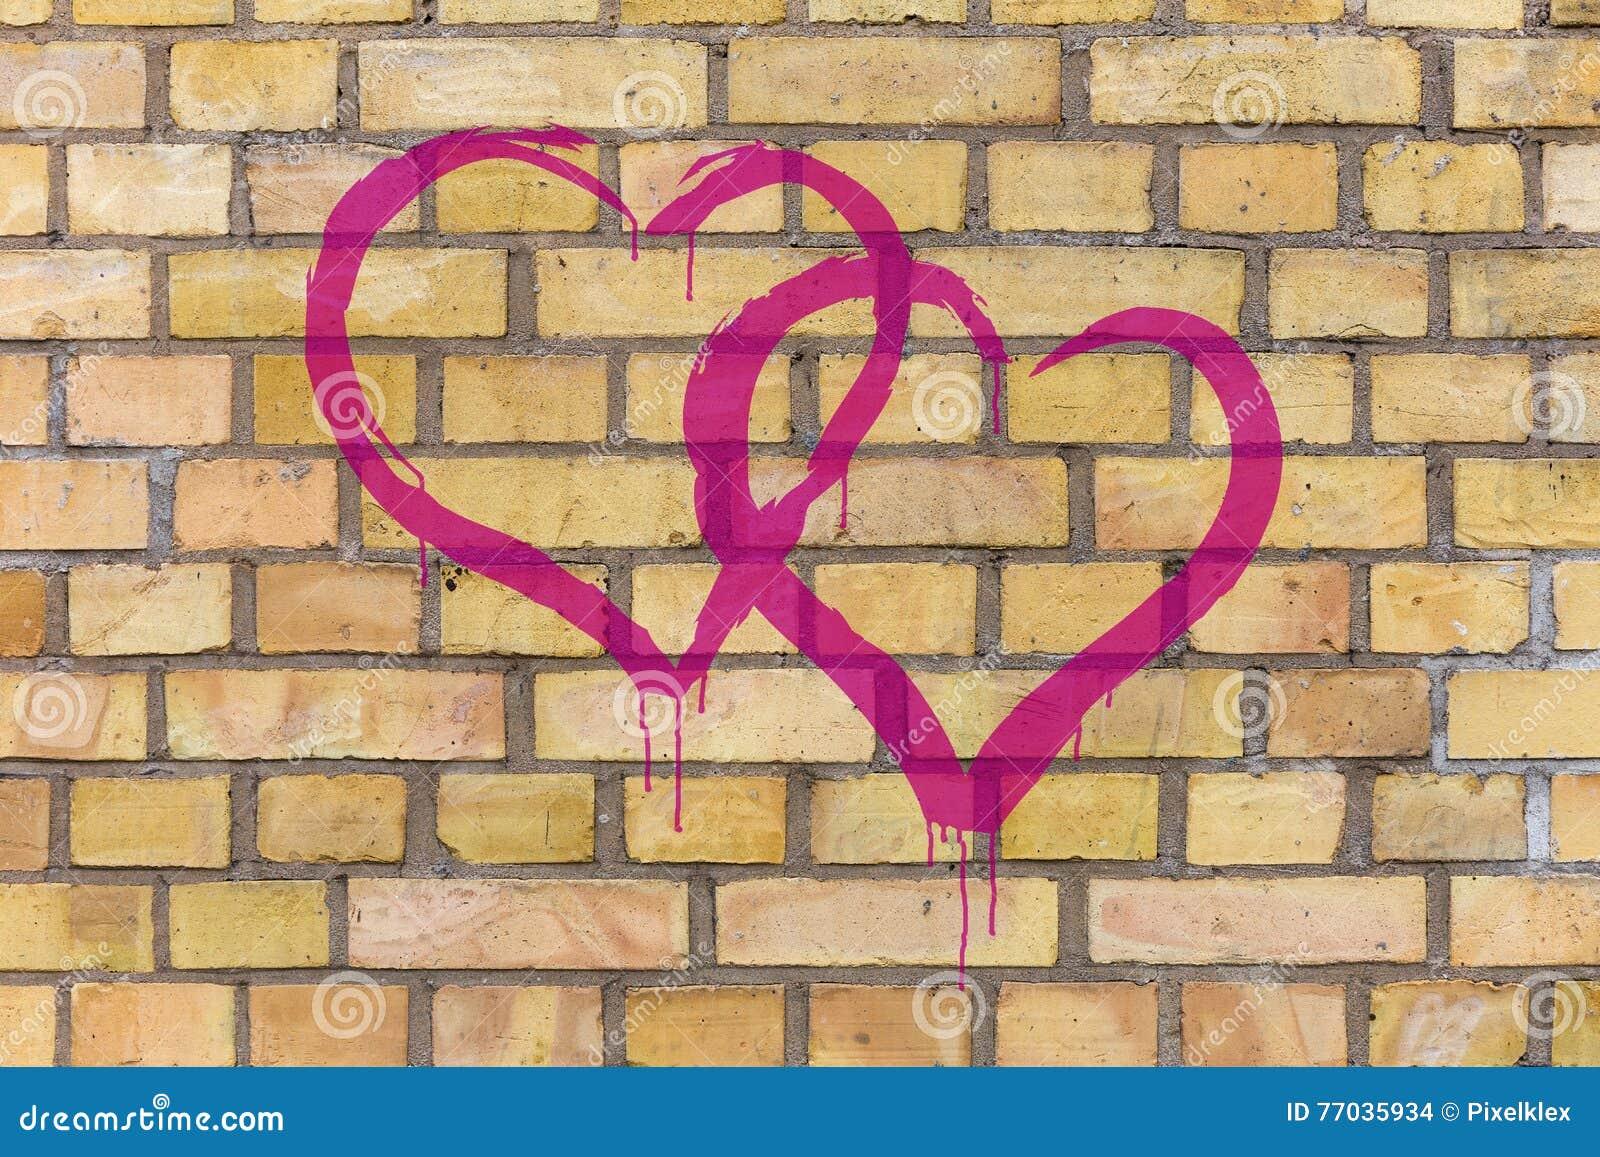 two graffiti hearts stock photo image of drop drawing 77035934